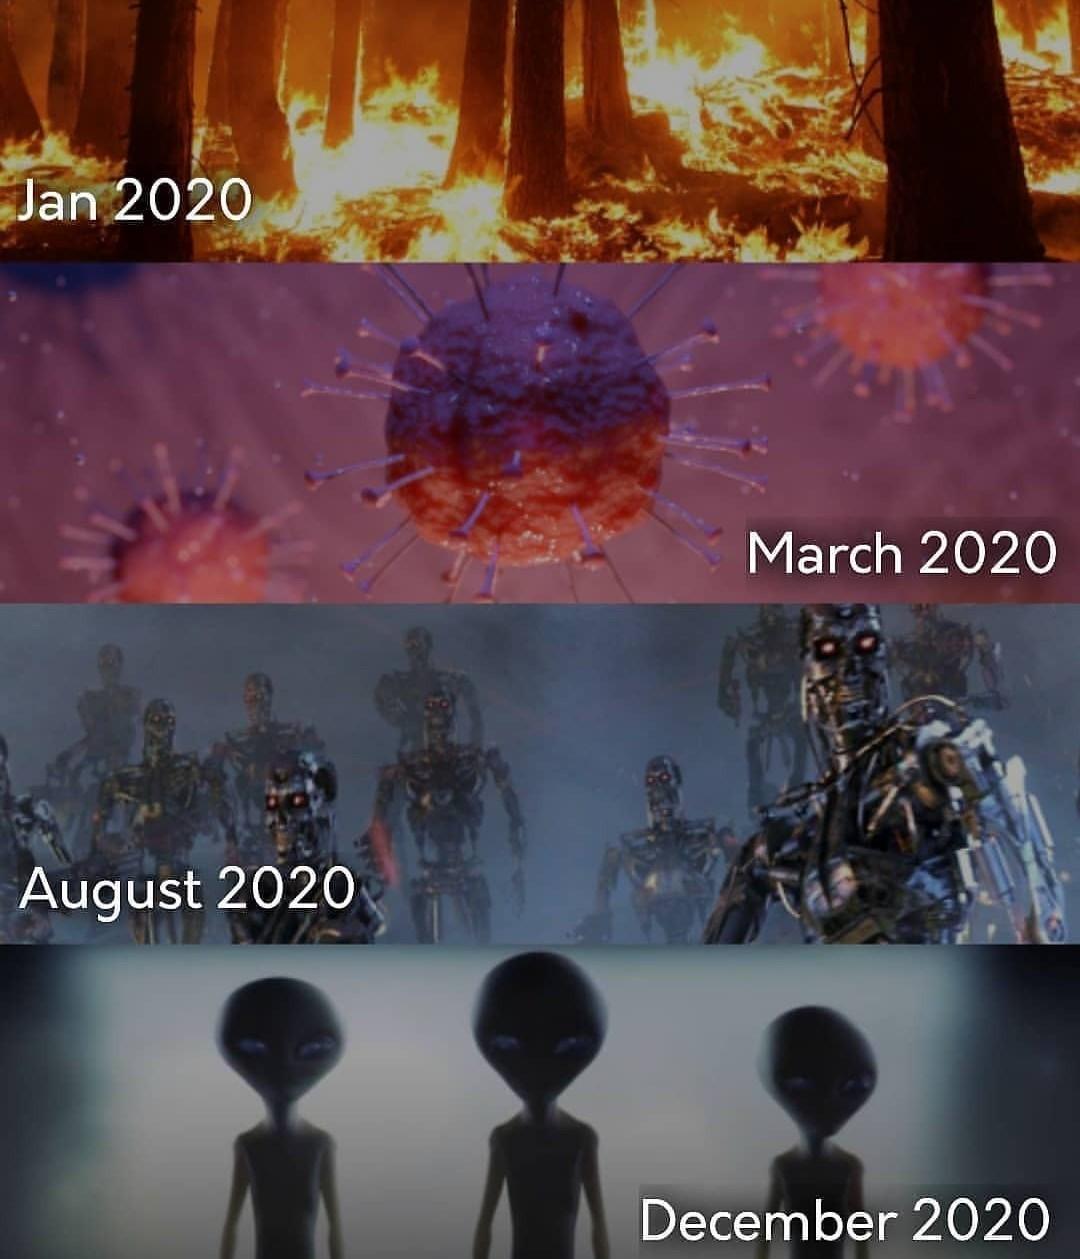 I miss 2019 - meme